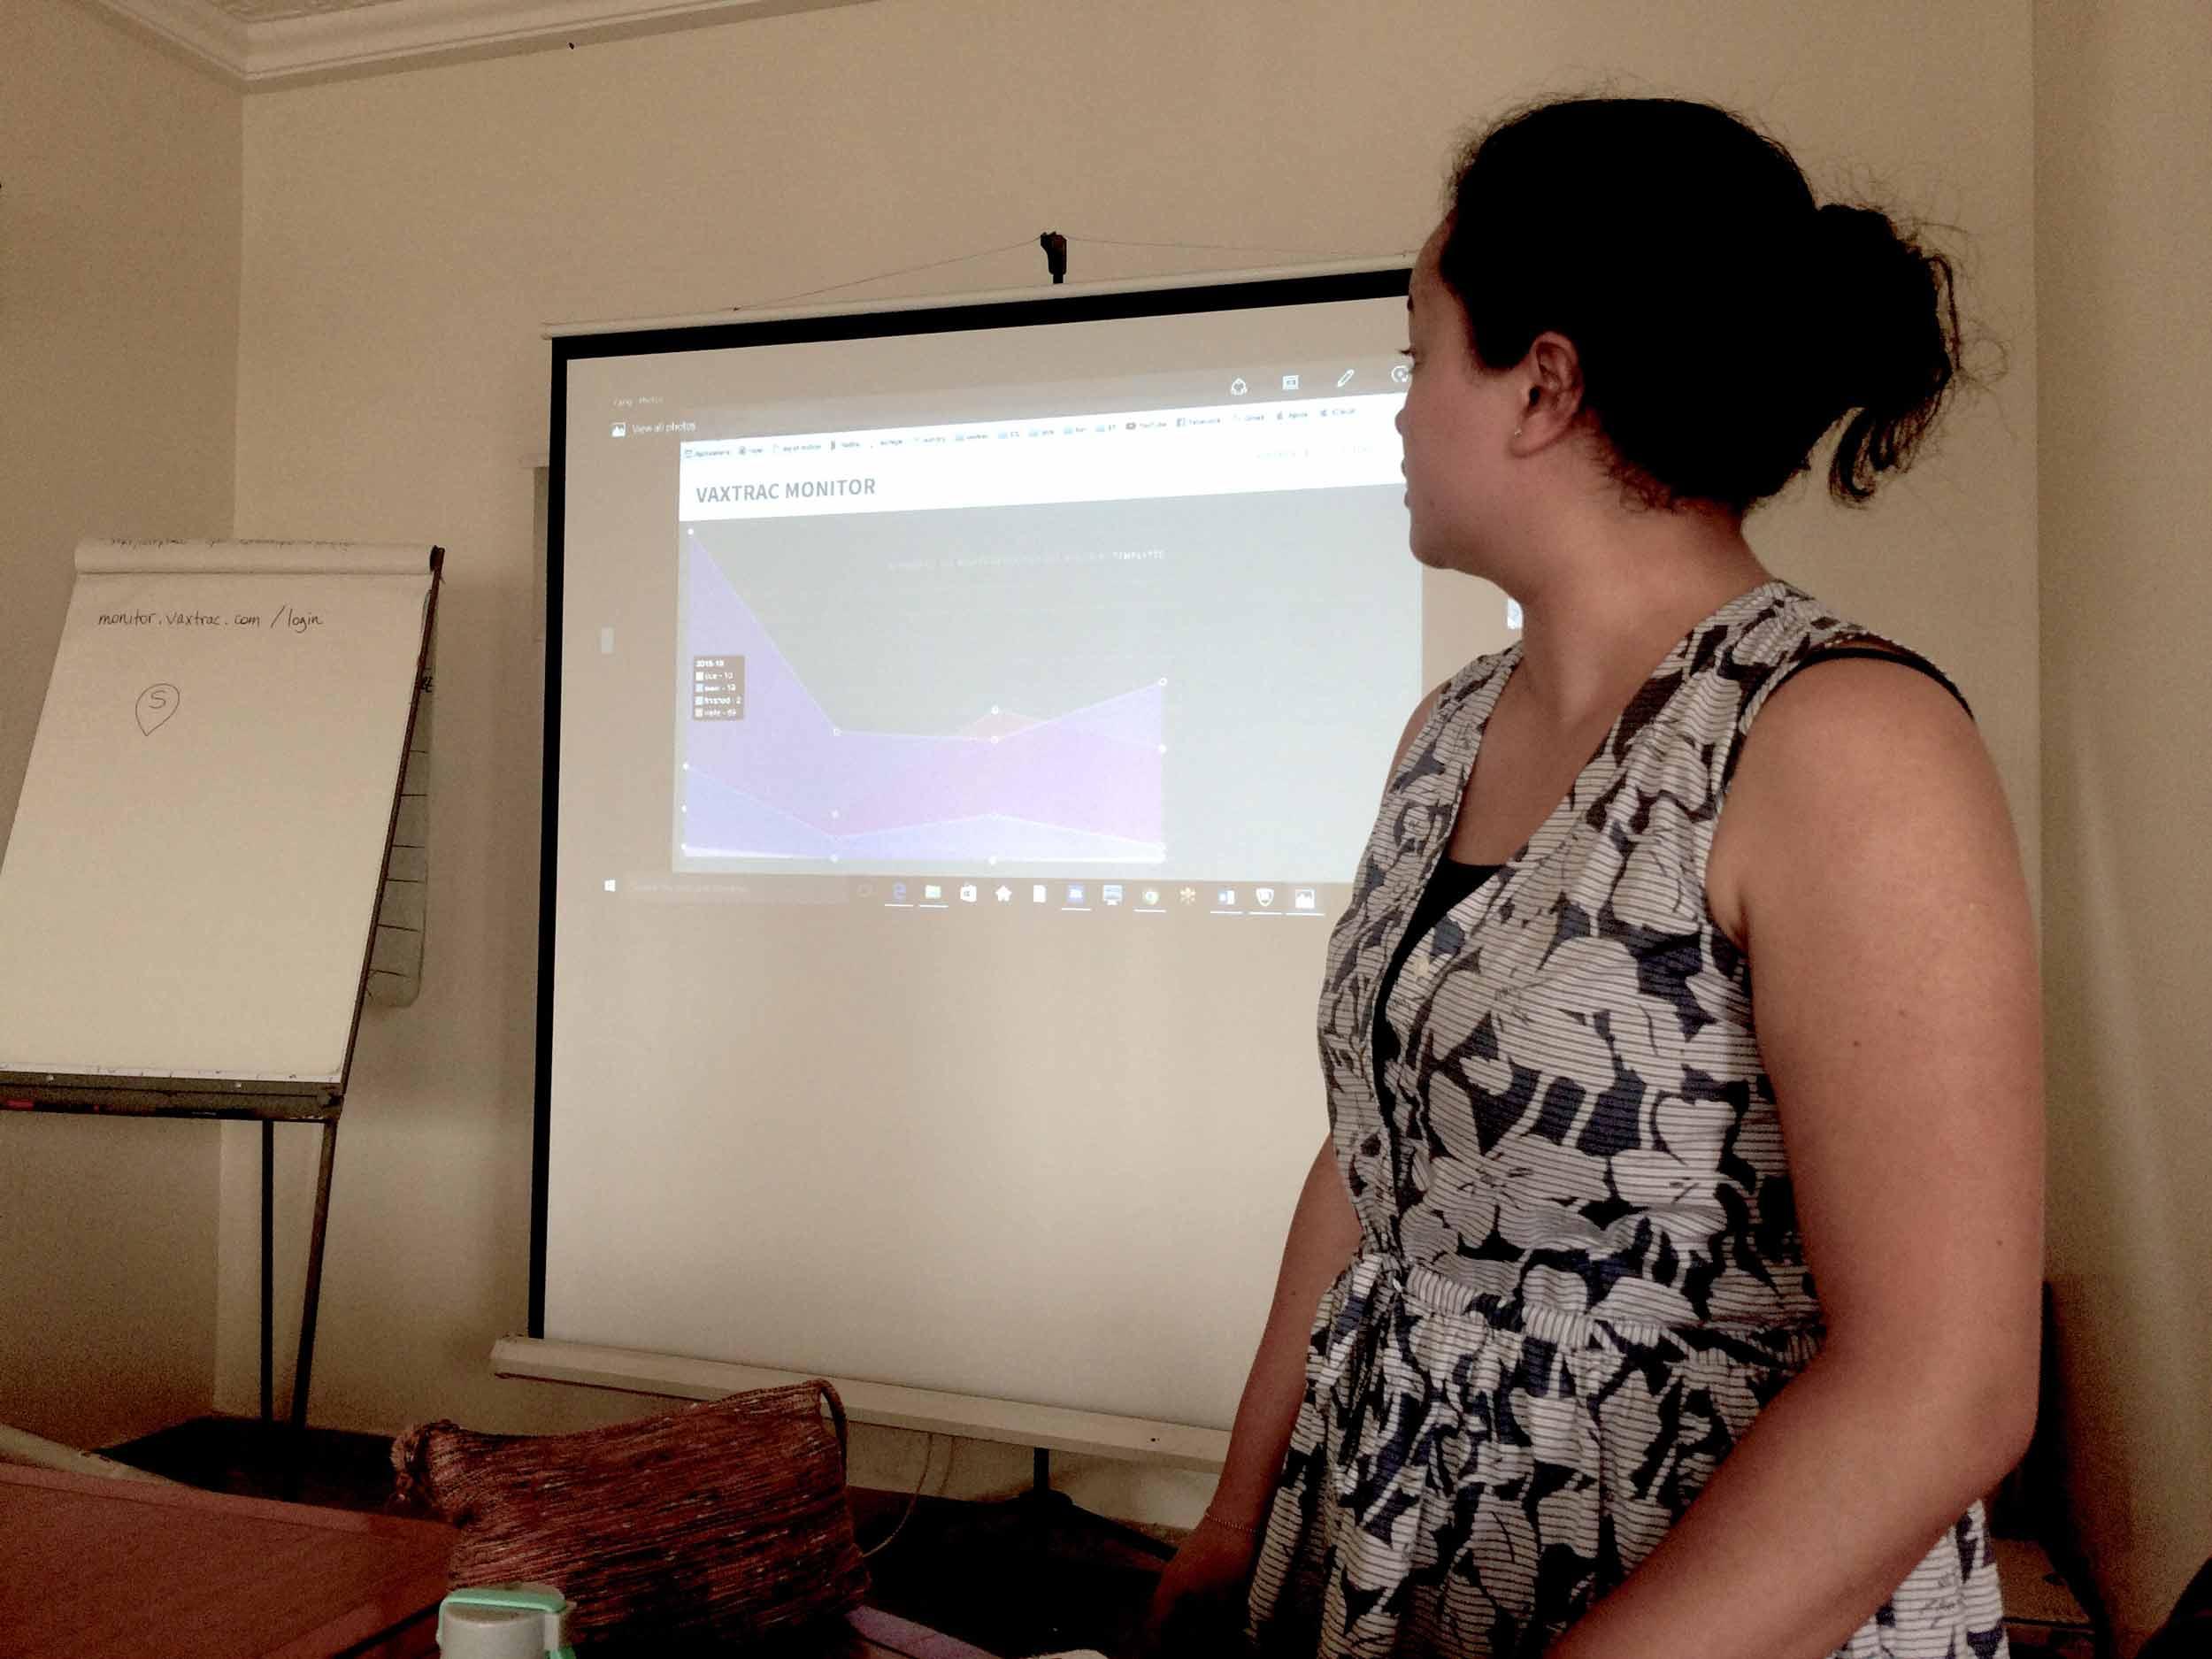 Sam facilitating the feedback session on VaxTrac monitor